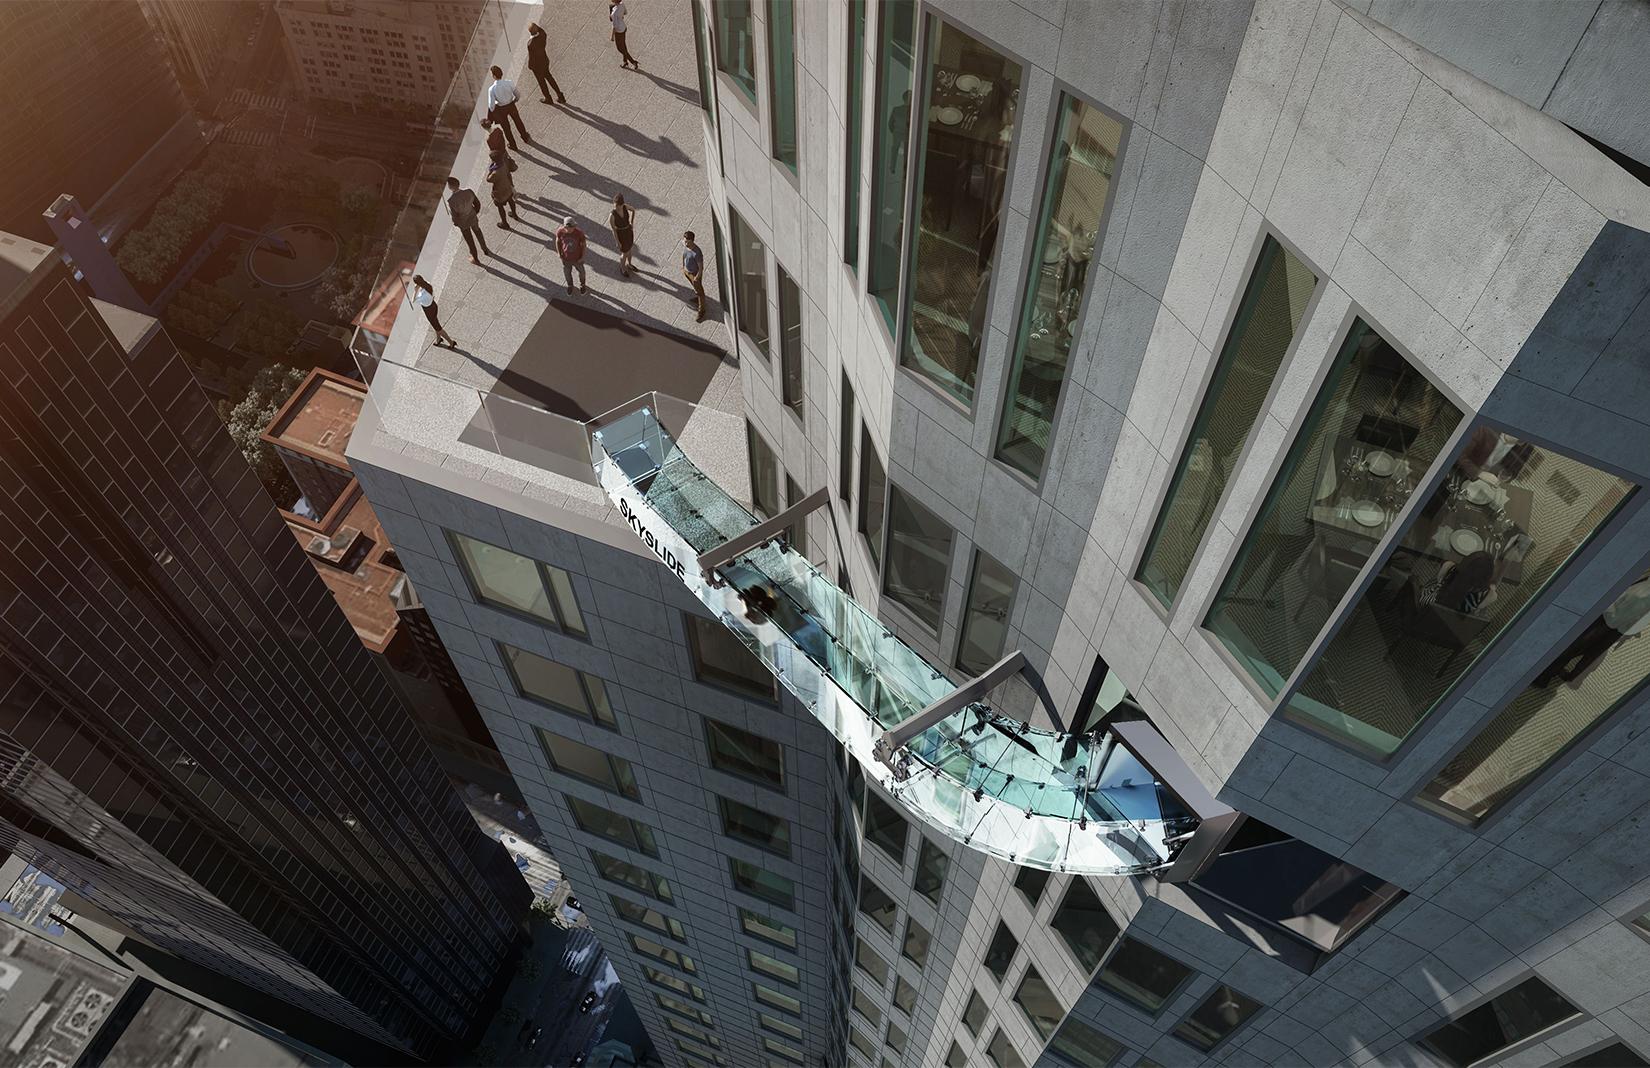 US Bank Tower slide in Downtown LA